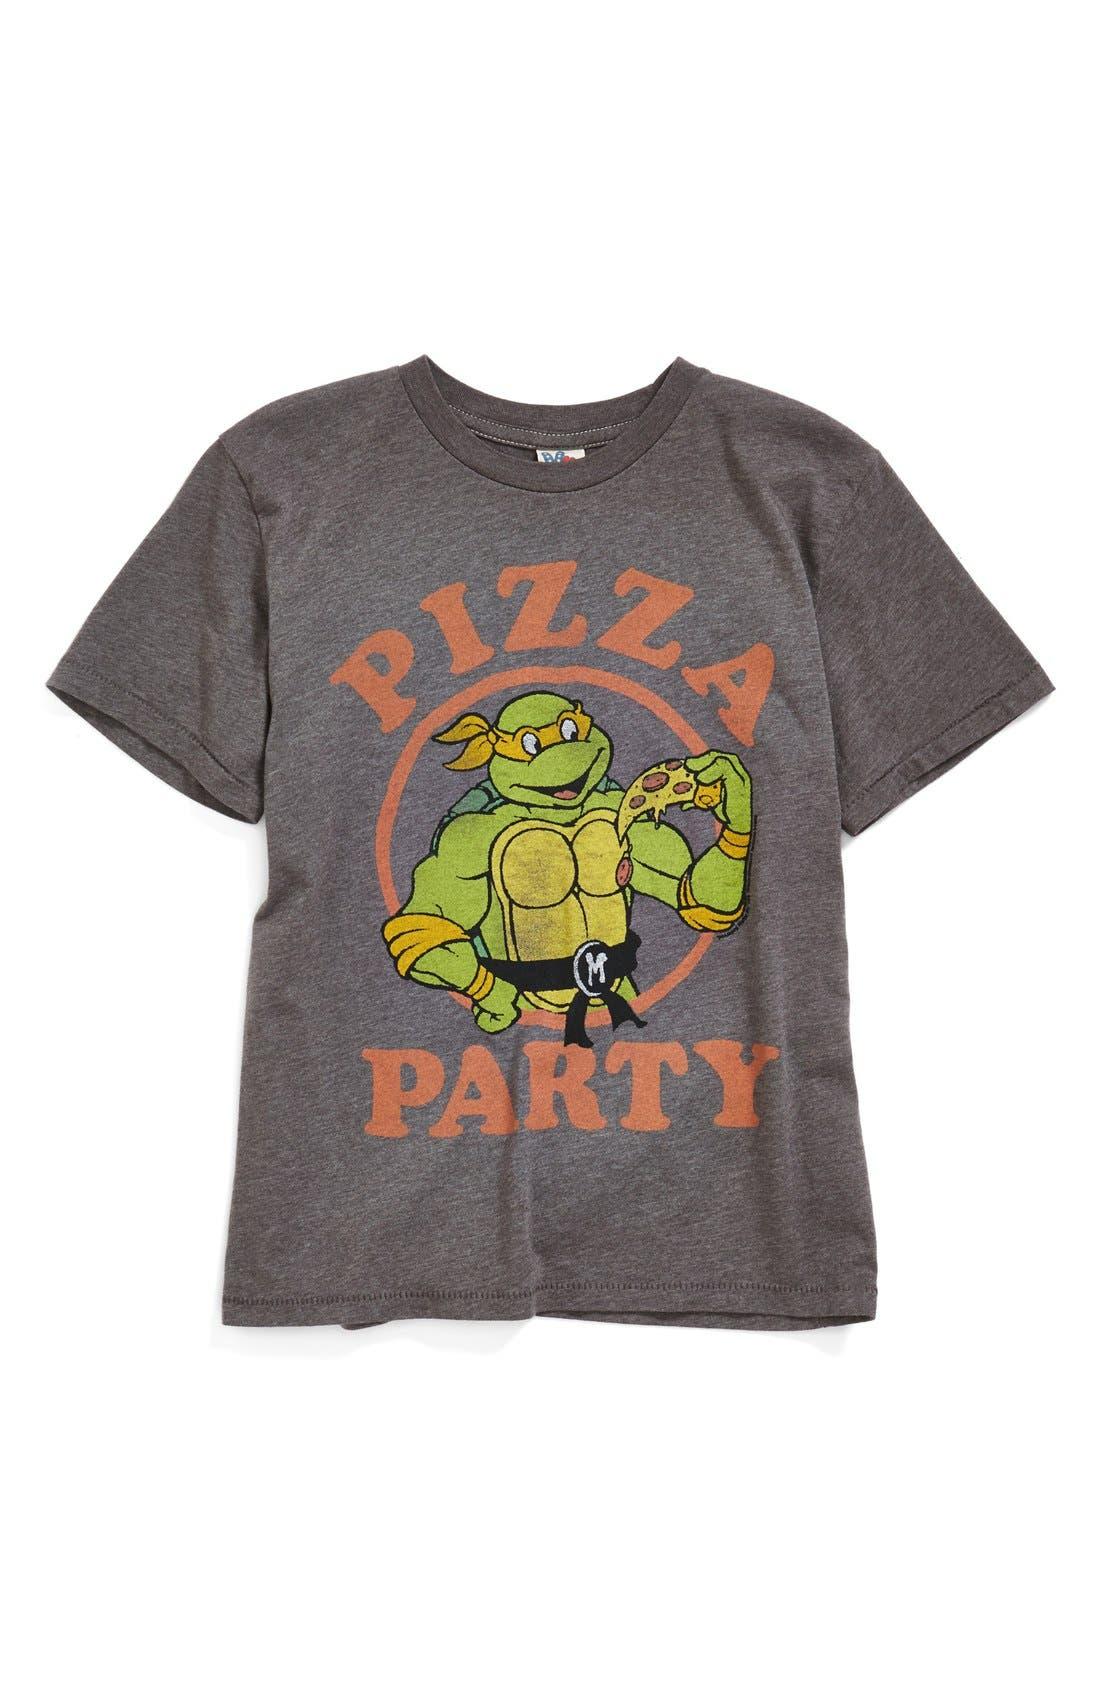 Main Image - Junk Food 'Teenage Mutant Ninja Turtles - Pizza Party' Graphic T-Shirt (Toddler Boys & Little Boys)